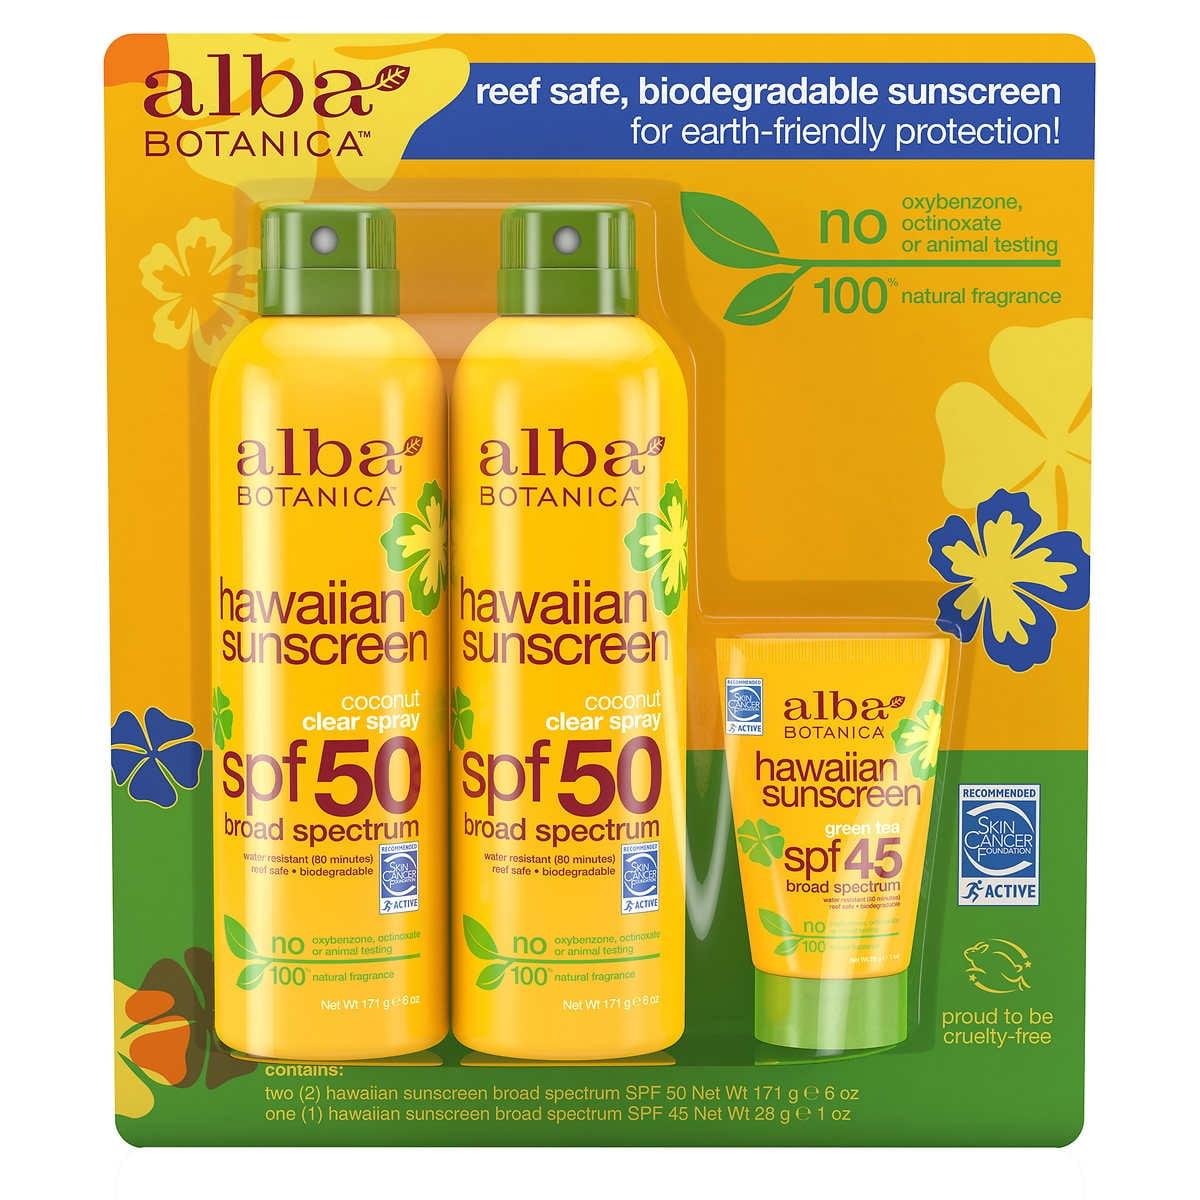 Alba Botanica Hawaiian Sunscreen Spray SPF50 6 oz., 2-pack + Travel Size 1 oz.